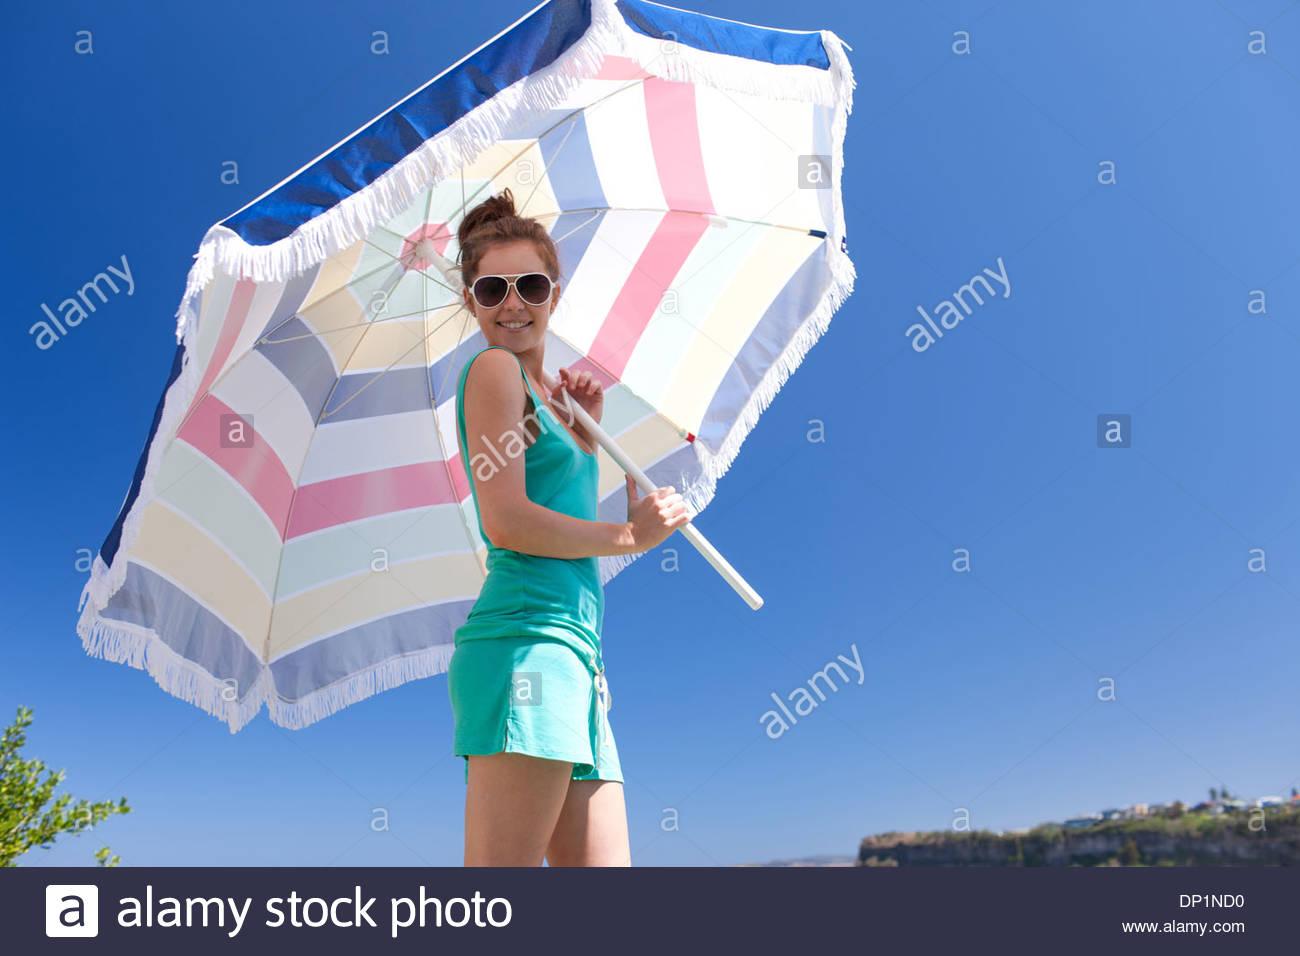 Woman in sunglasses holding beach umbrella - Stock Image